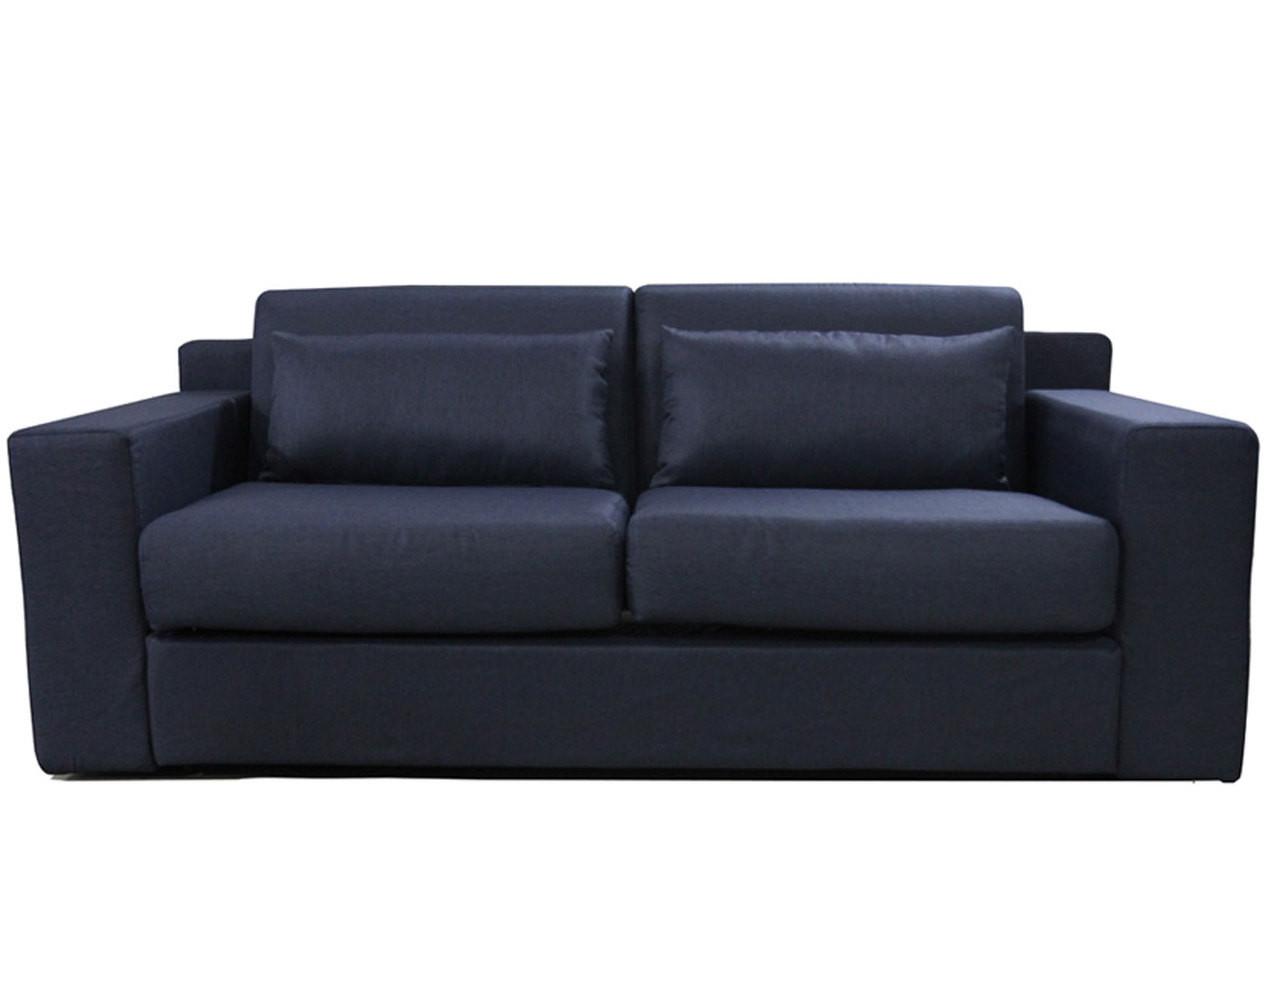 Lunar Pull Out Sofa Bed   Dark Blue   Online Furniture ...